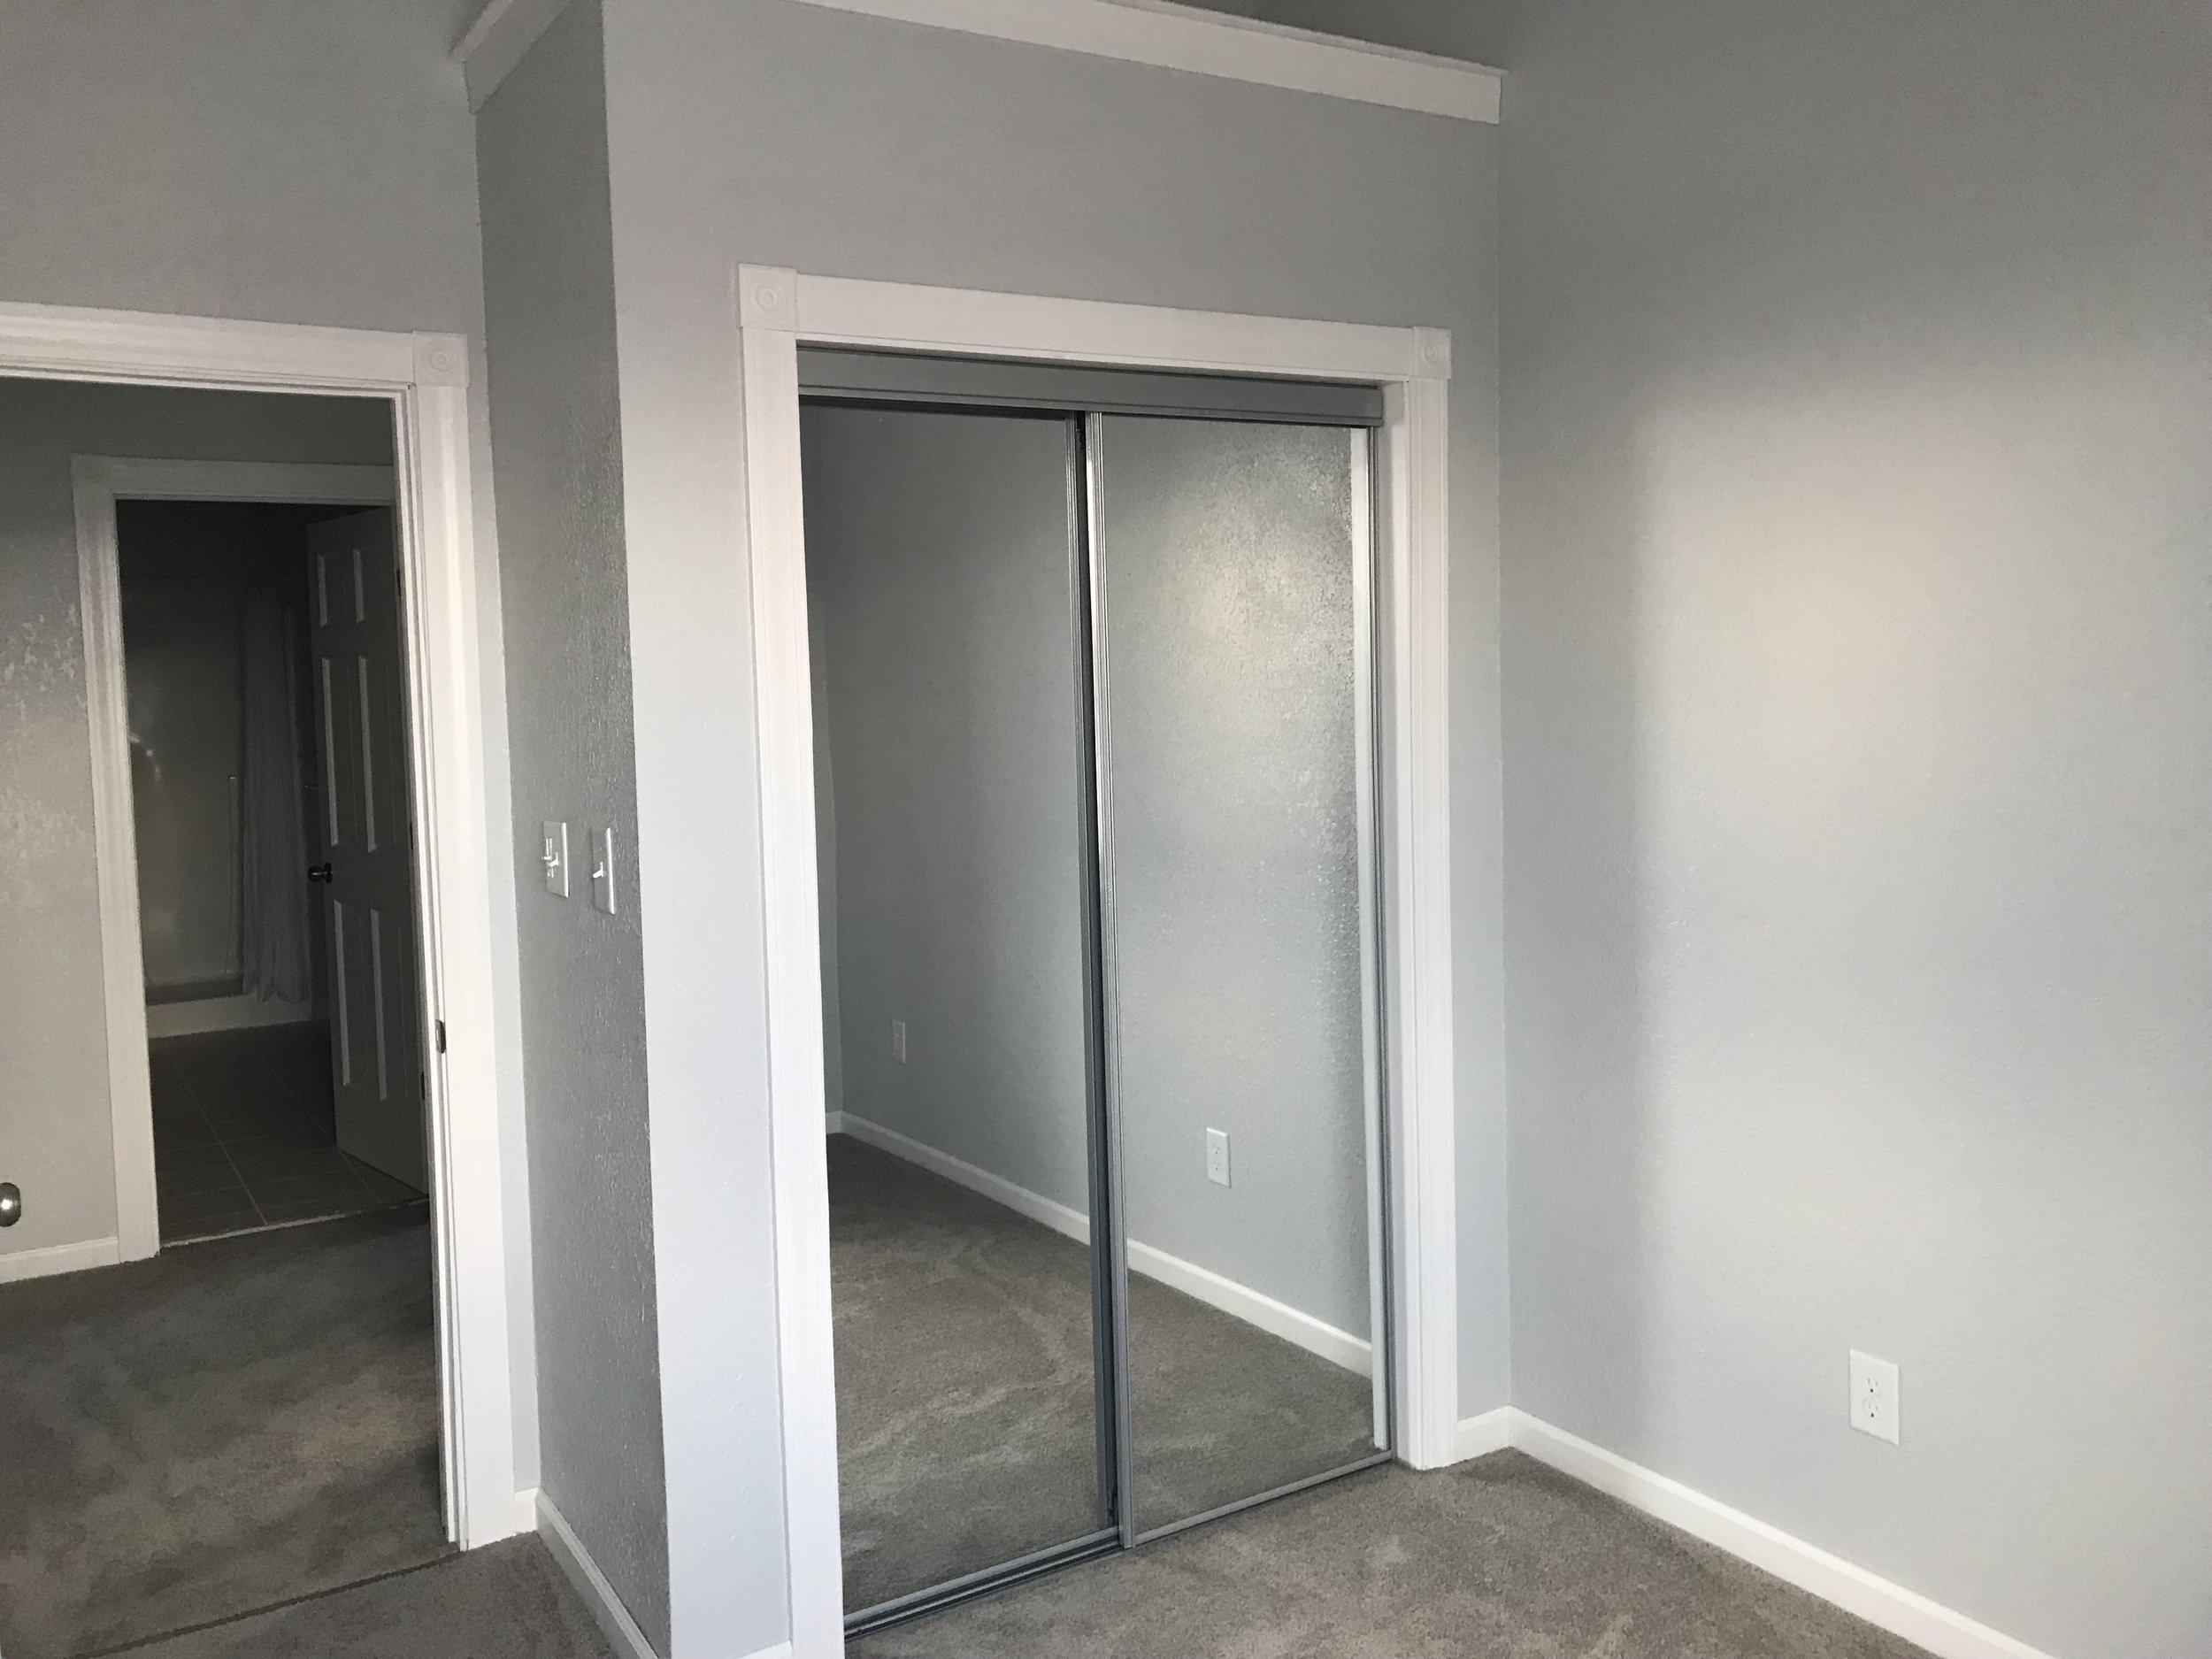 Bedroom 2 mirrored closet